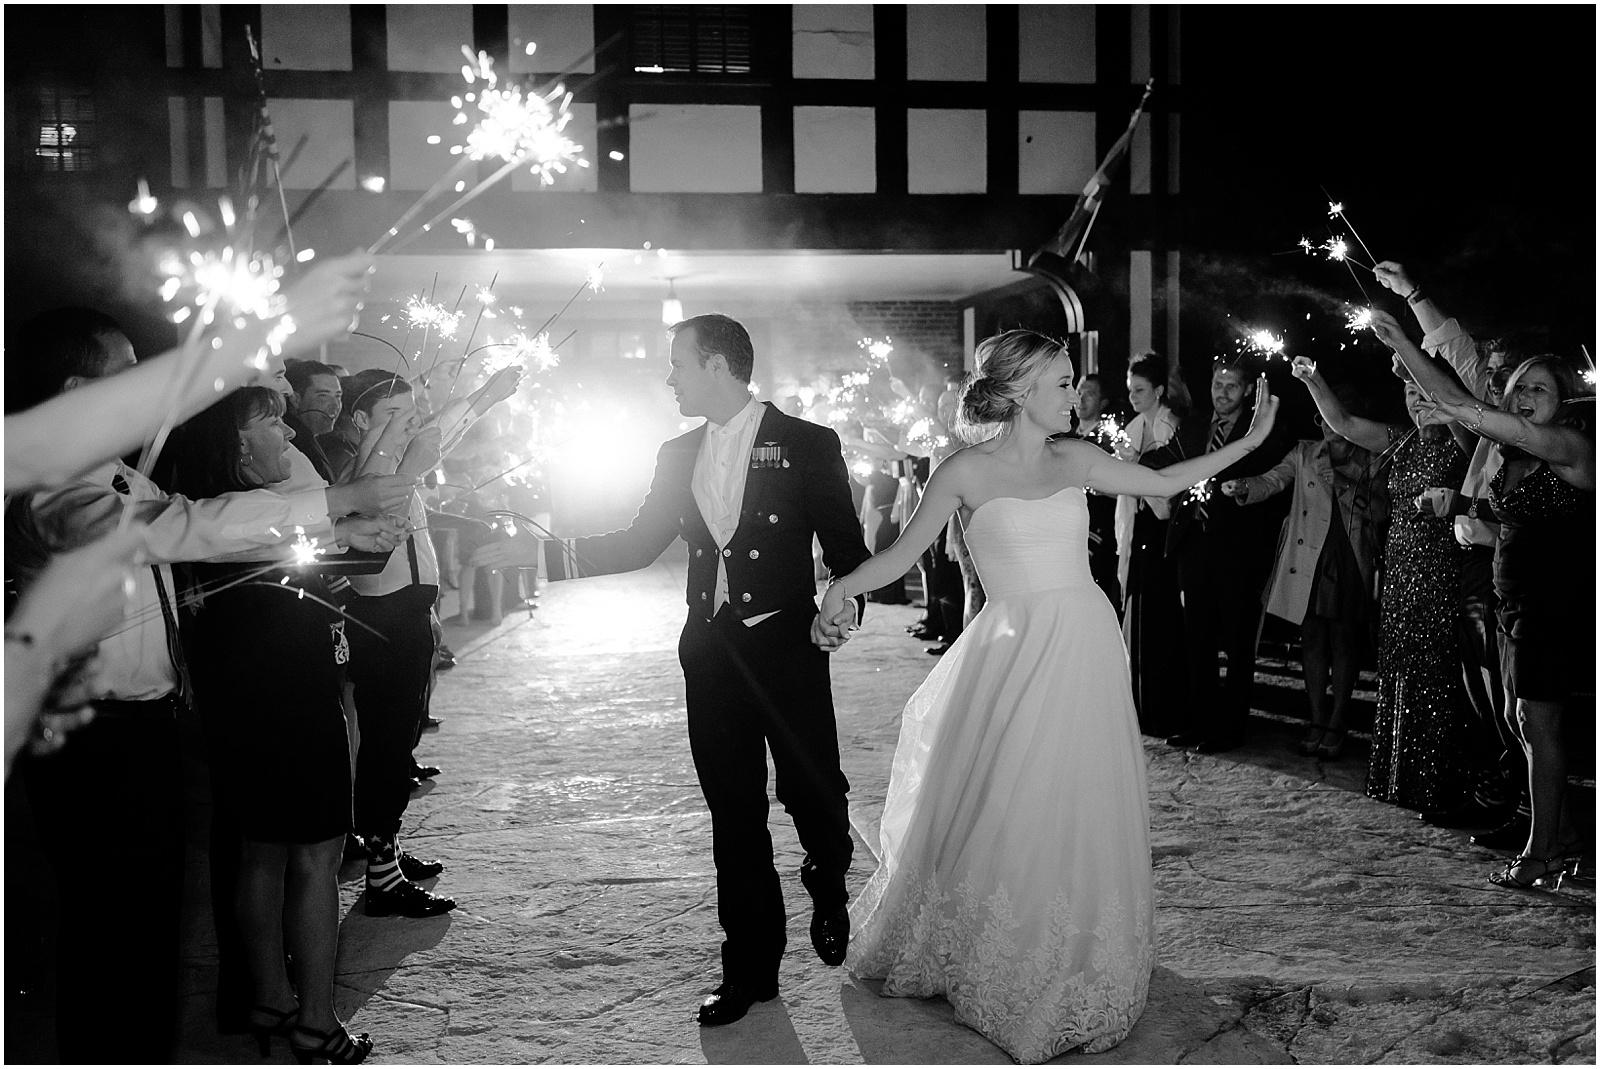 glen_echo_st_louis_mo_wedding_0156.jpg